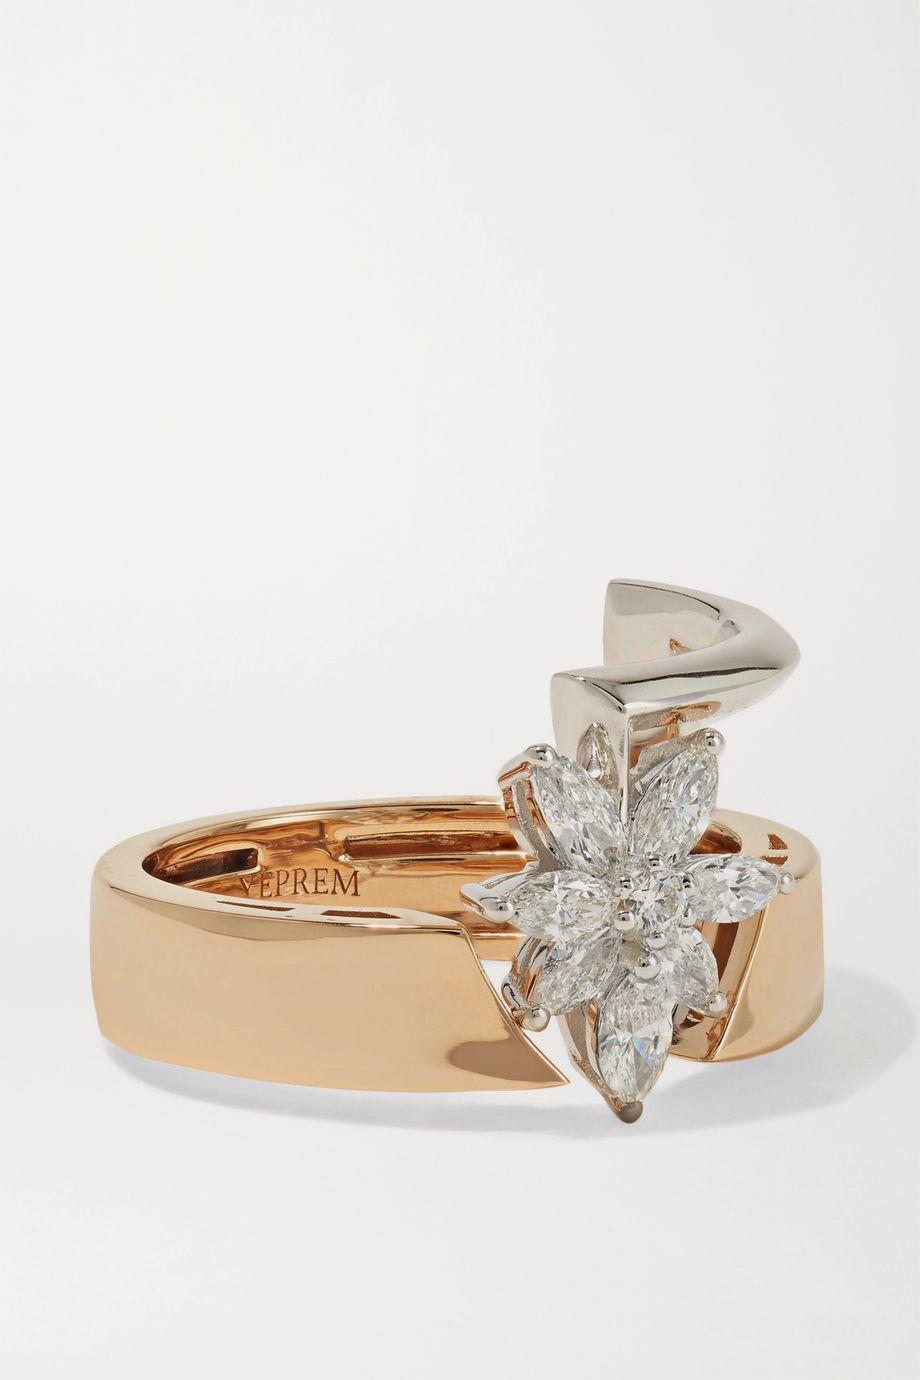 YEPREM 18-karat rose and white gold diamond ring